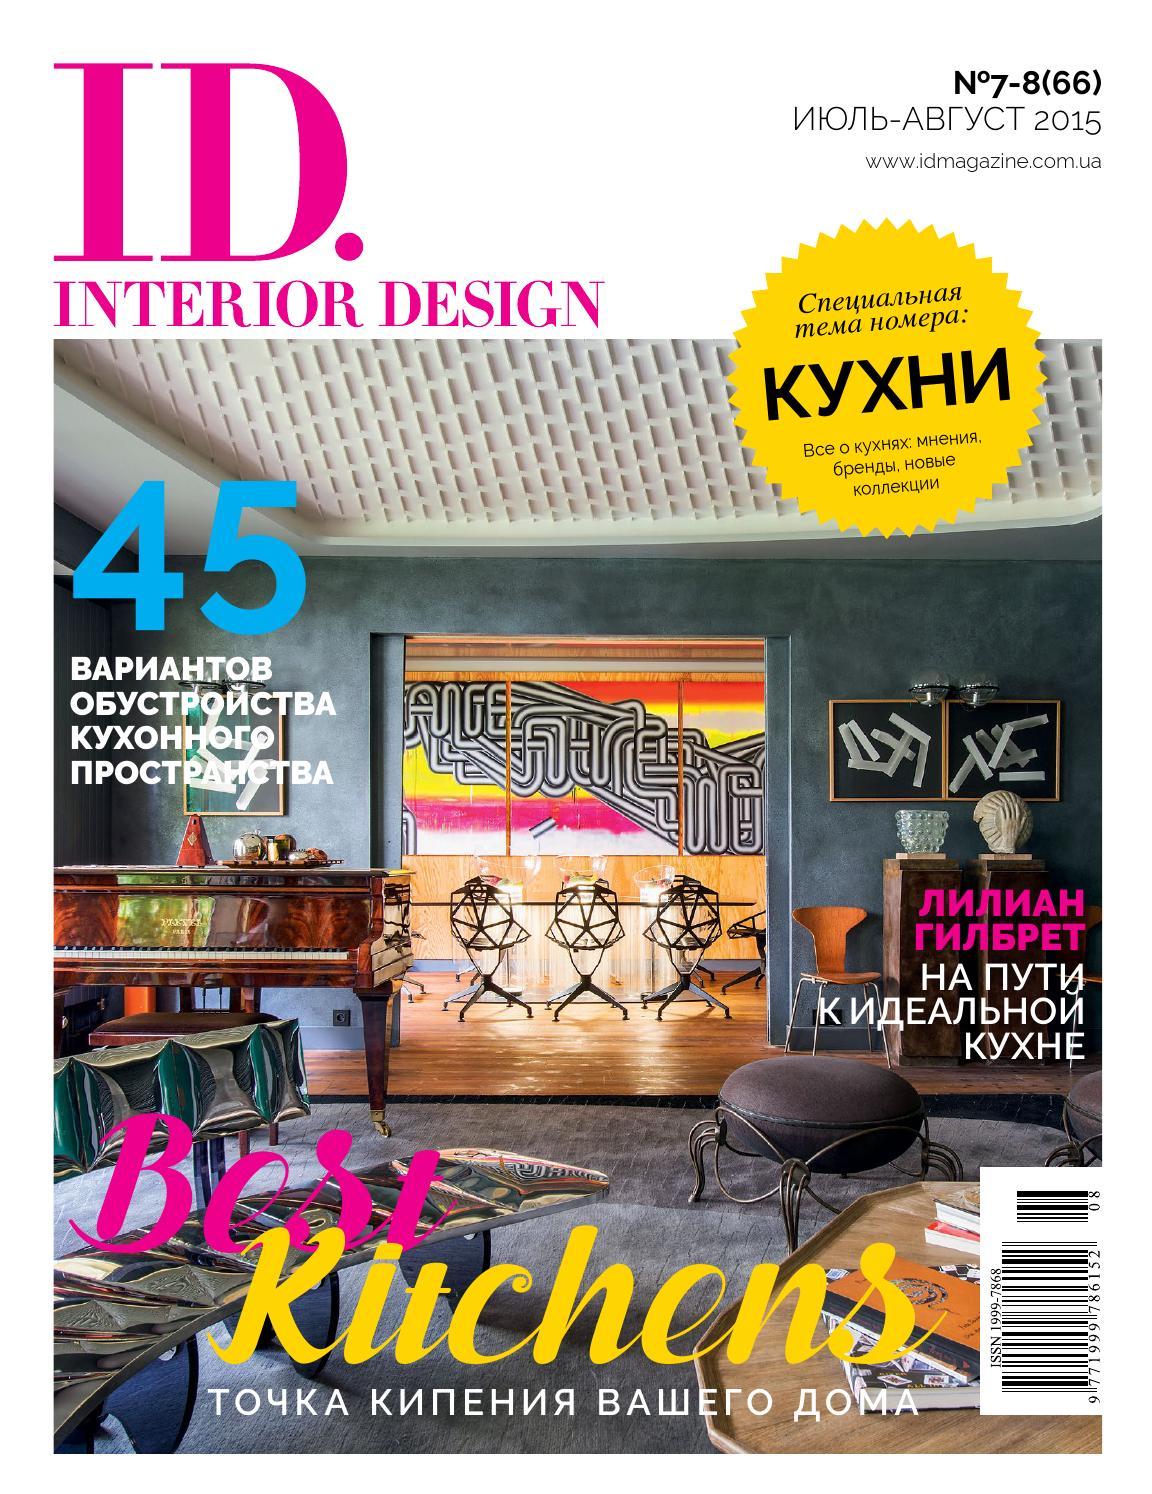 id interior design 66 by id magazine issuu. Black Bedroom Furniture Sets. Home Design Ideas